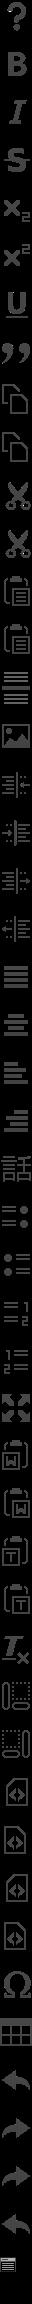 core/assets/vendor/ckeditor/skins/moono-lisa/icons_hidpi.png